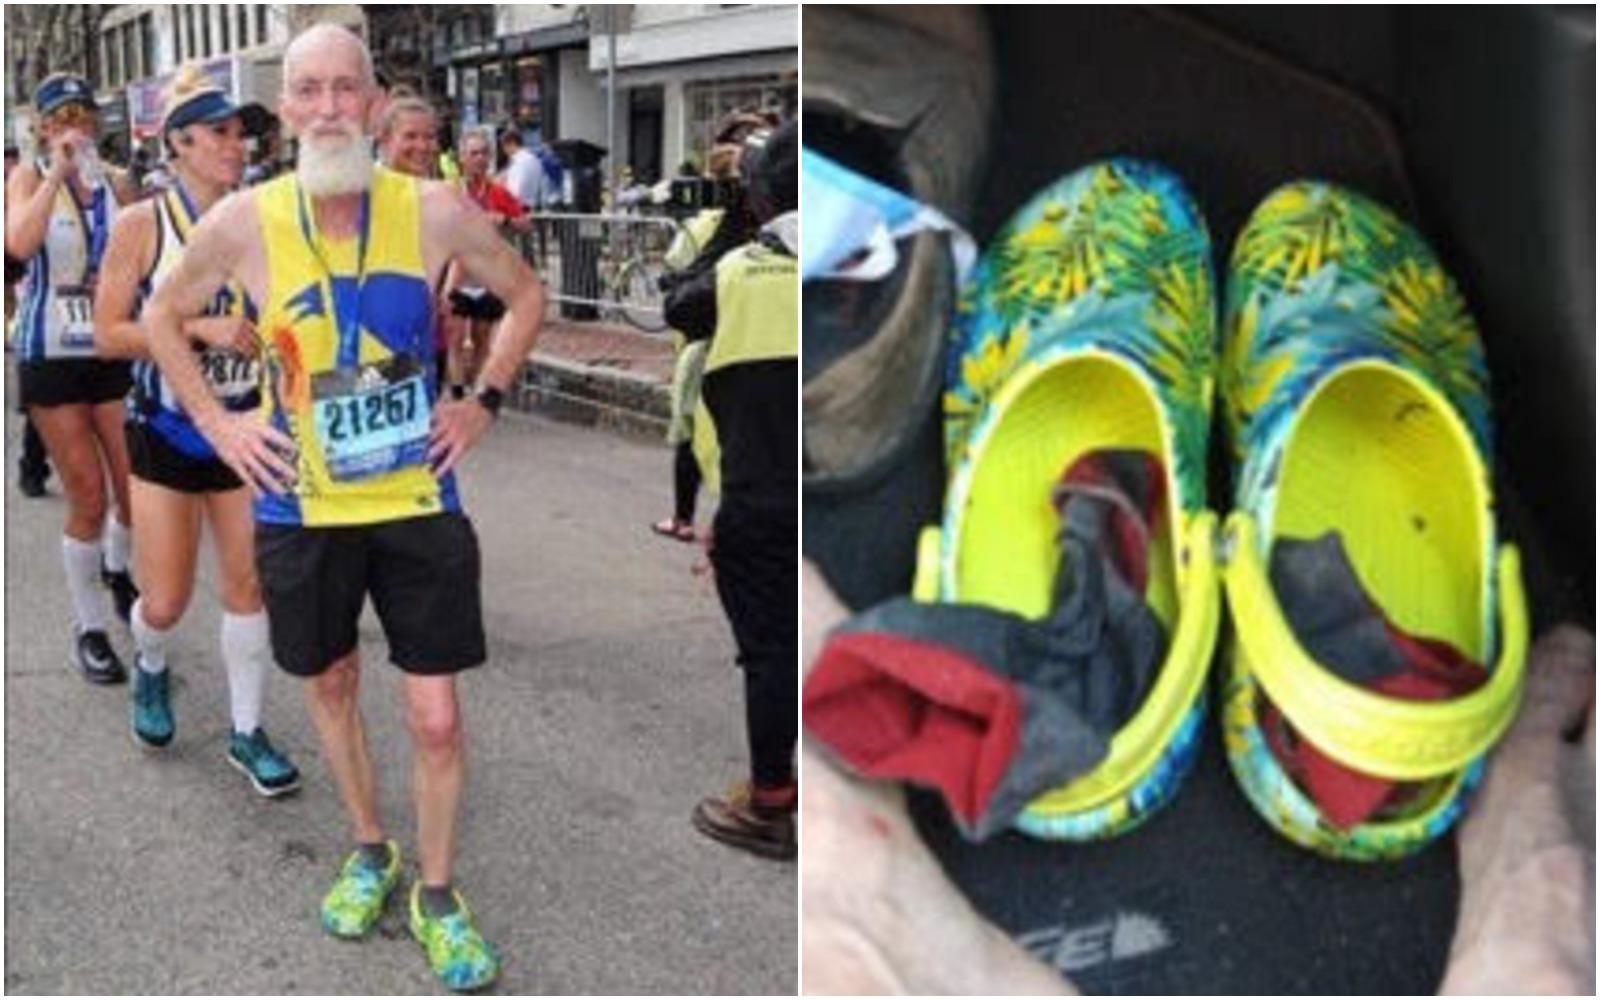 This Ellsworth runner wears Crocs to